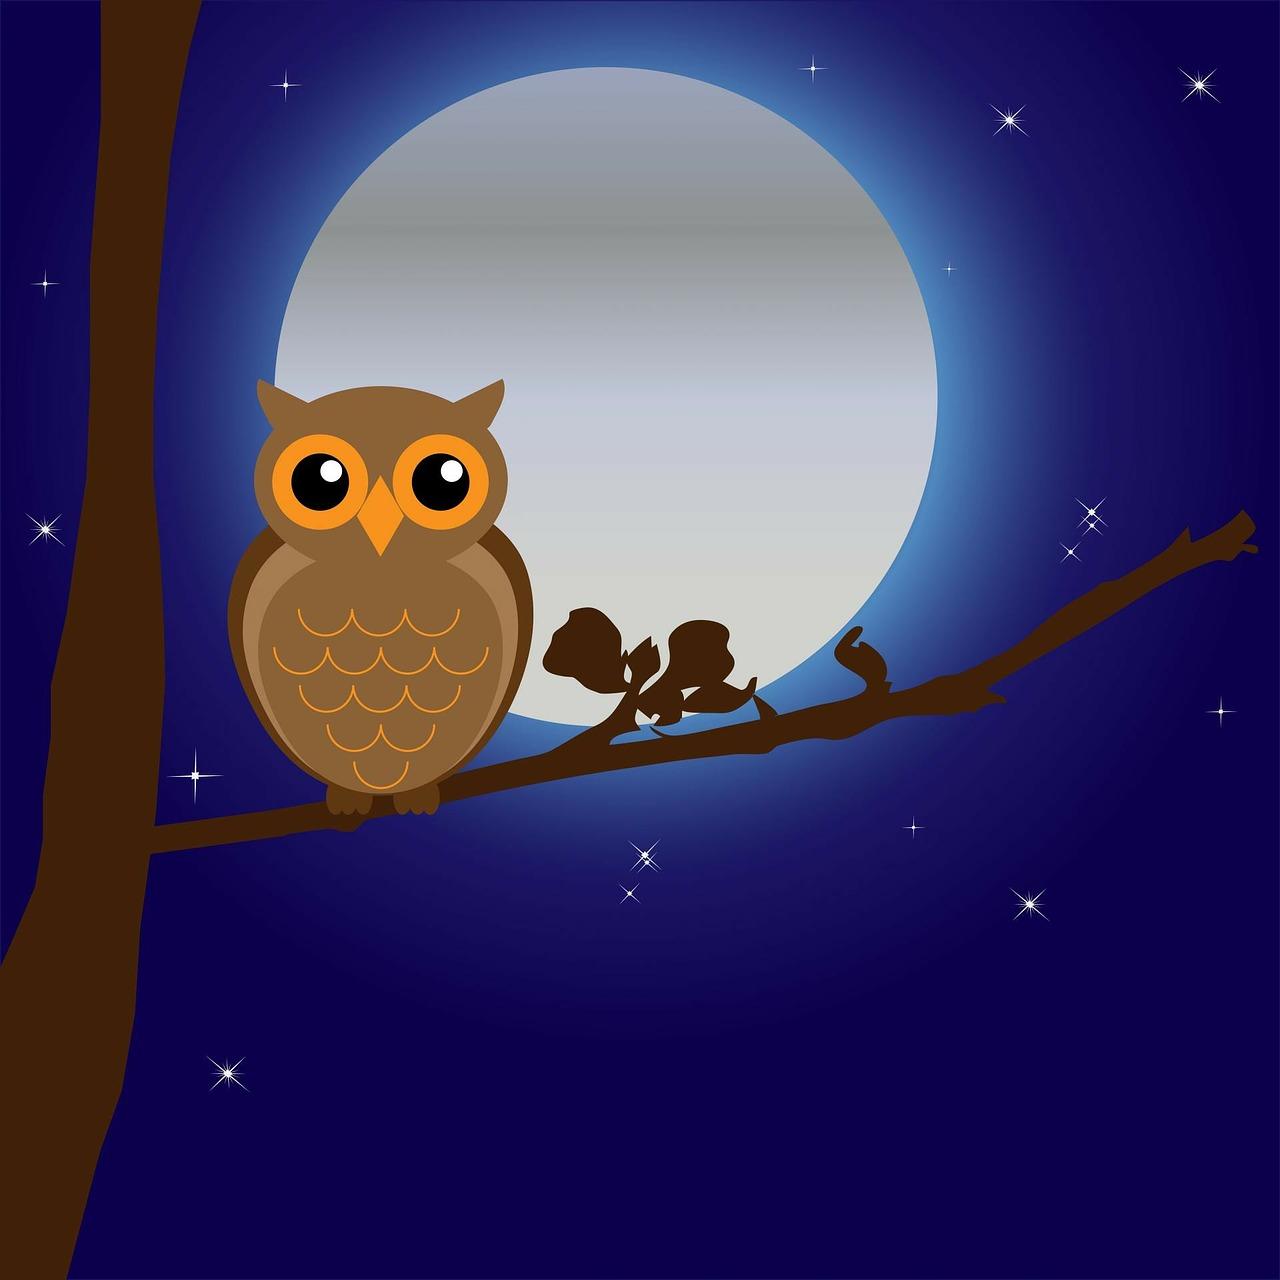 Картинки, доброй ночи полуночникам картинки